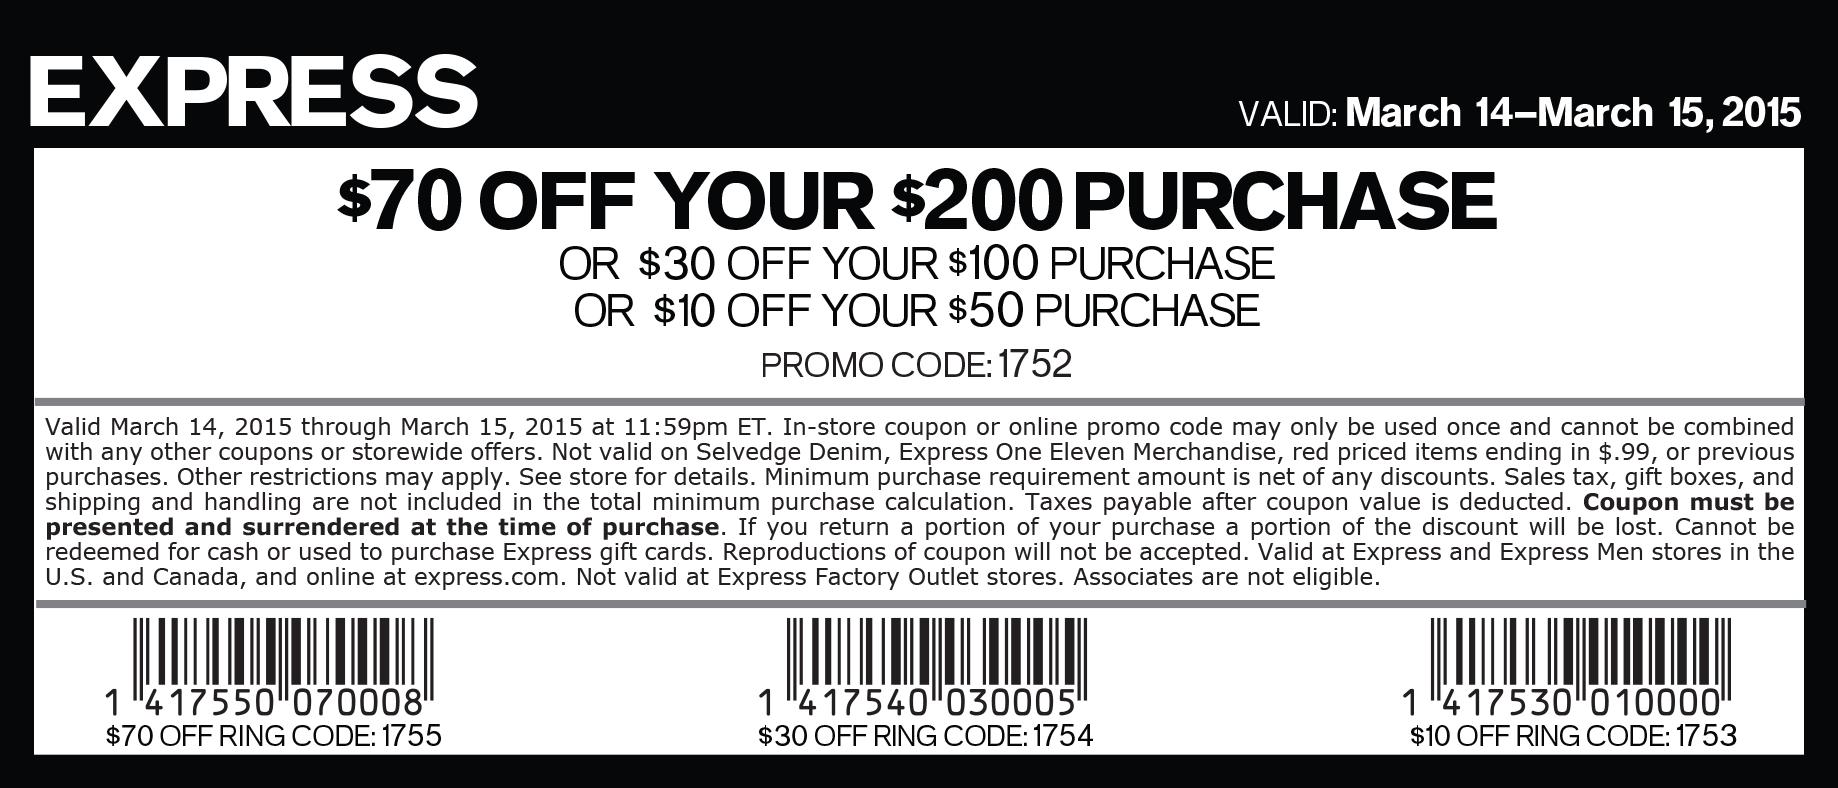 Express online coupon code 2018